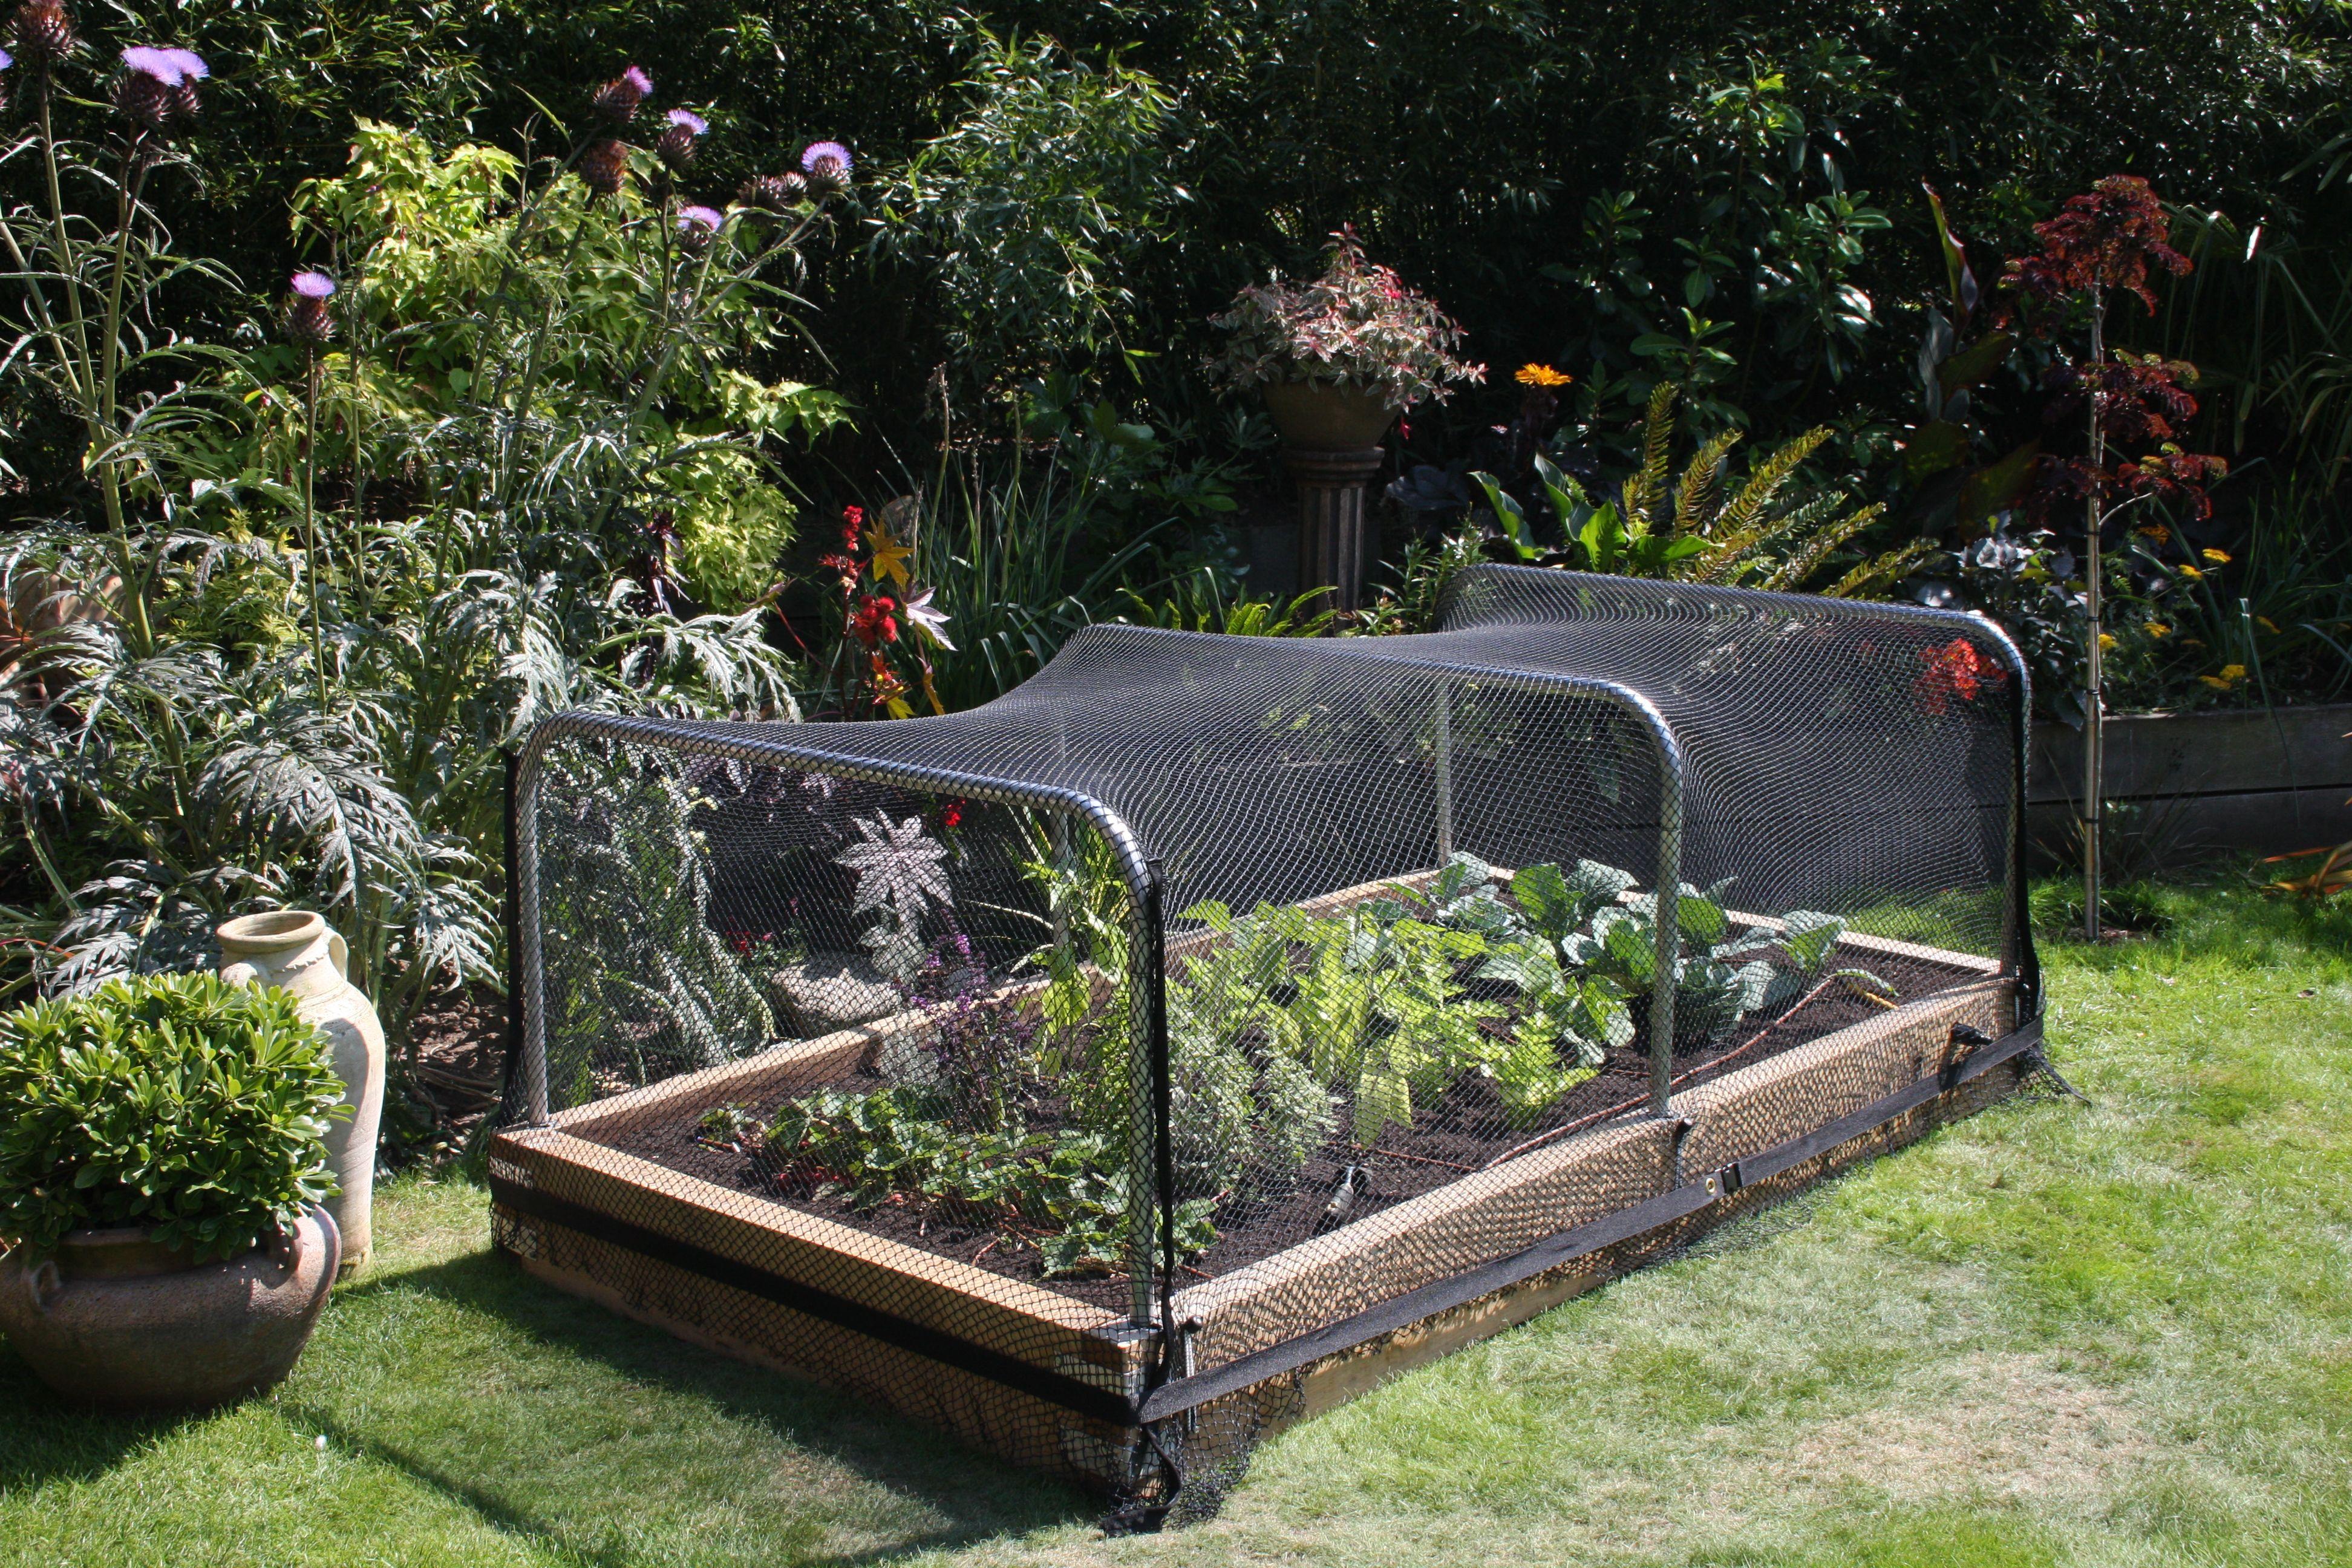 Raised Bed Garden Bird Netting Garden enclosure ideas